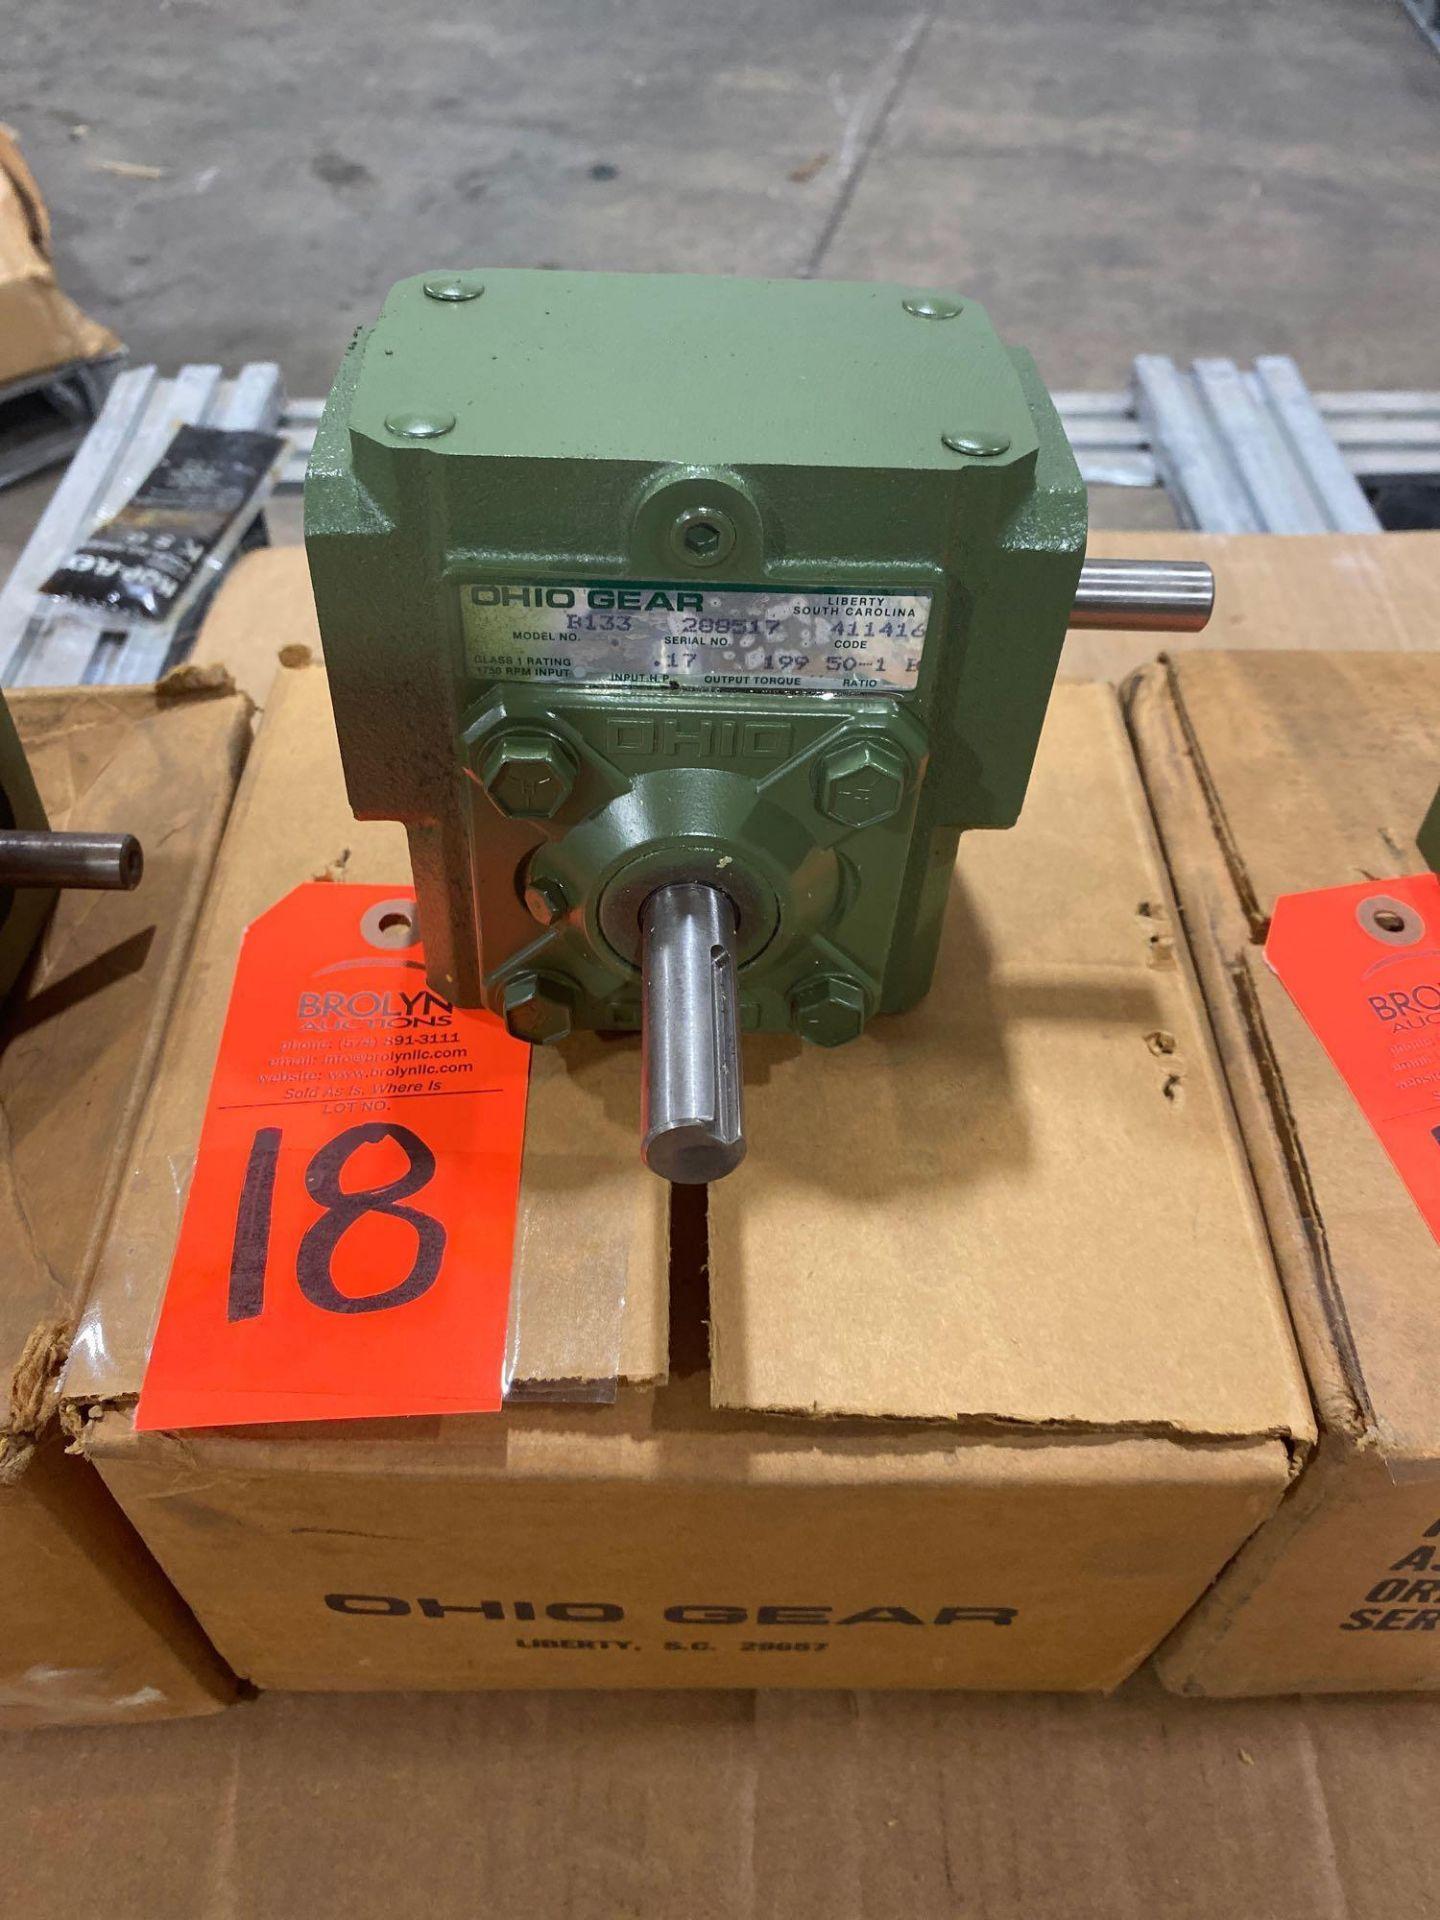 Lot 18 - Ohio Gear model B-133 gearbox. 50:1 ratio. New in box.